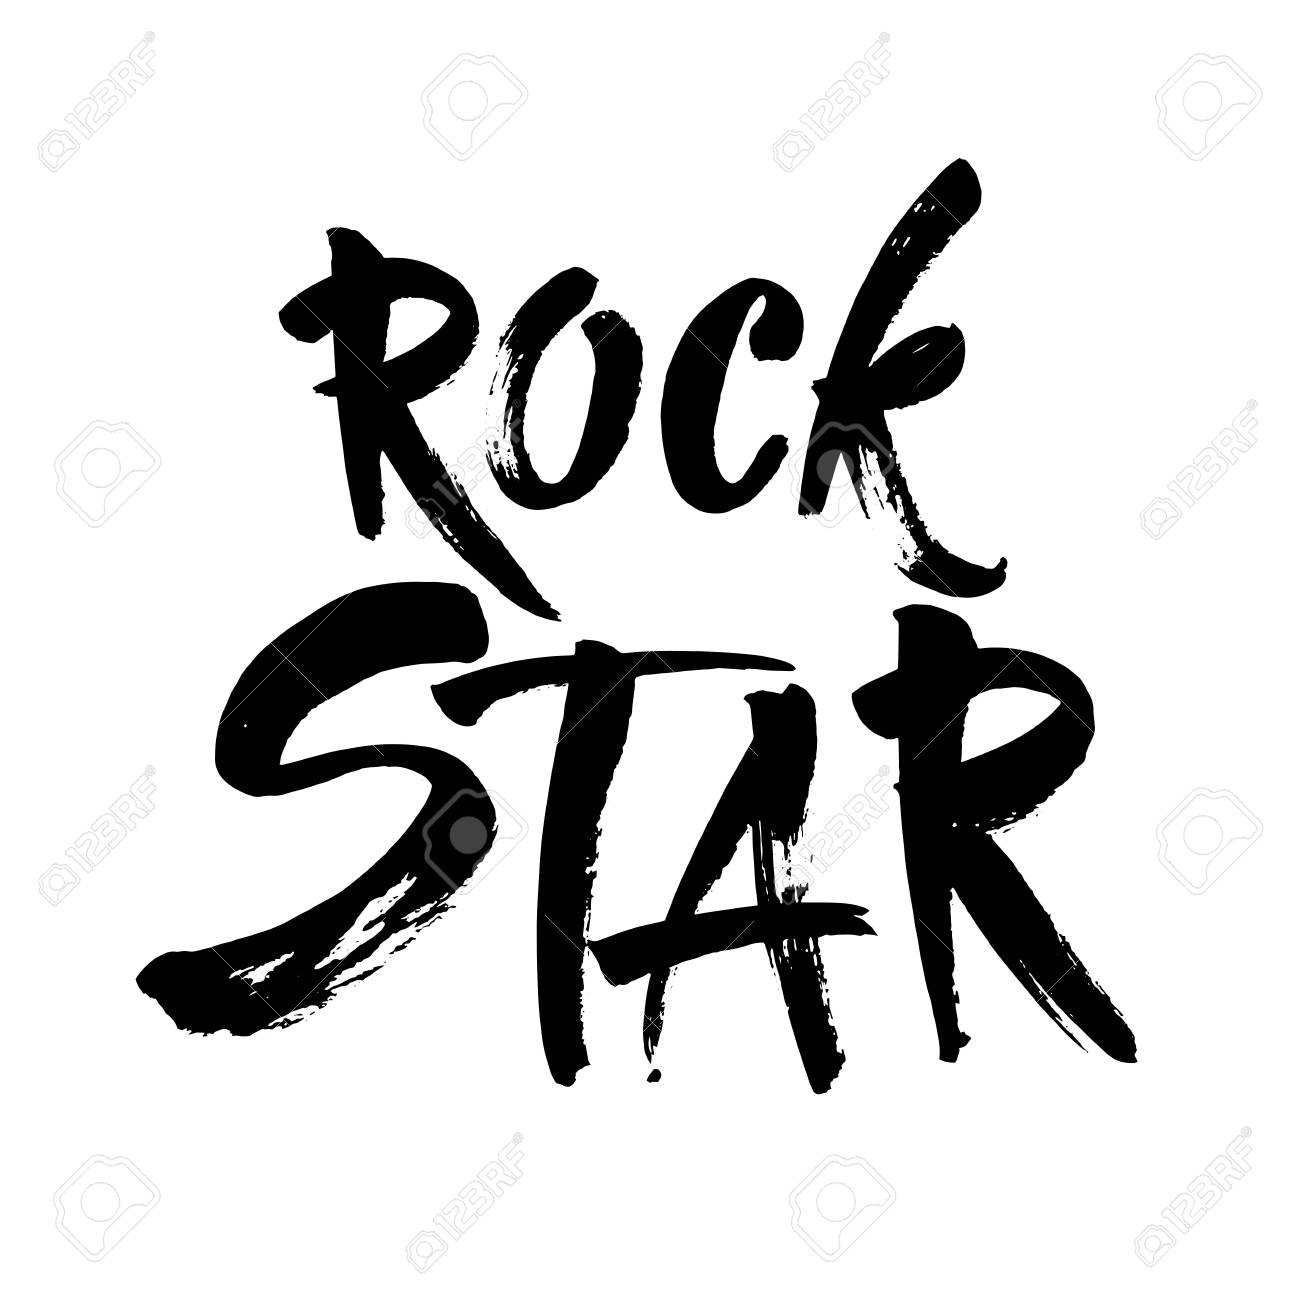 Rock star postcard ink illustration modern brush calligraphy isolated on white background